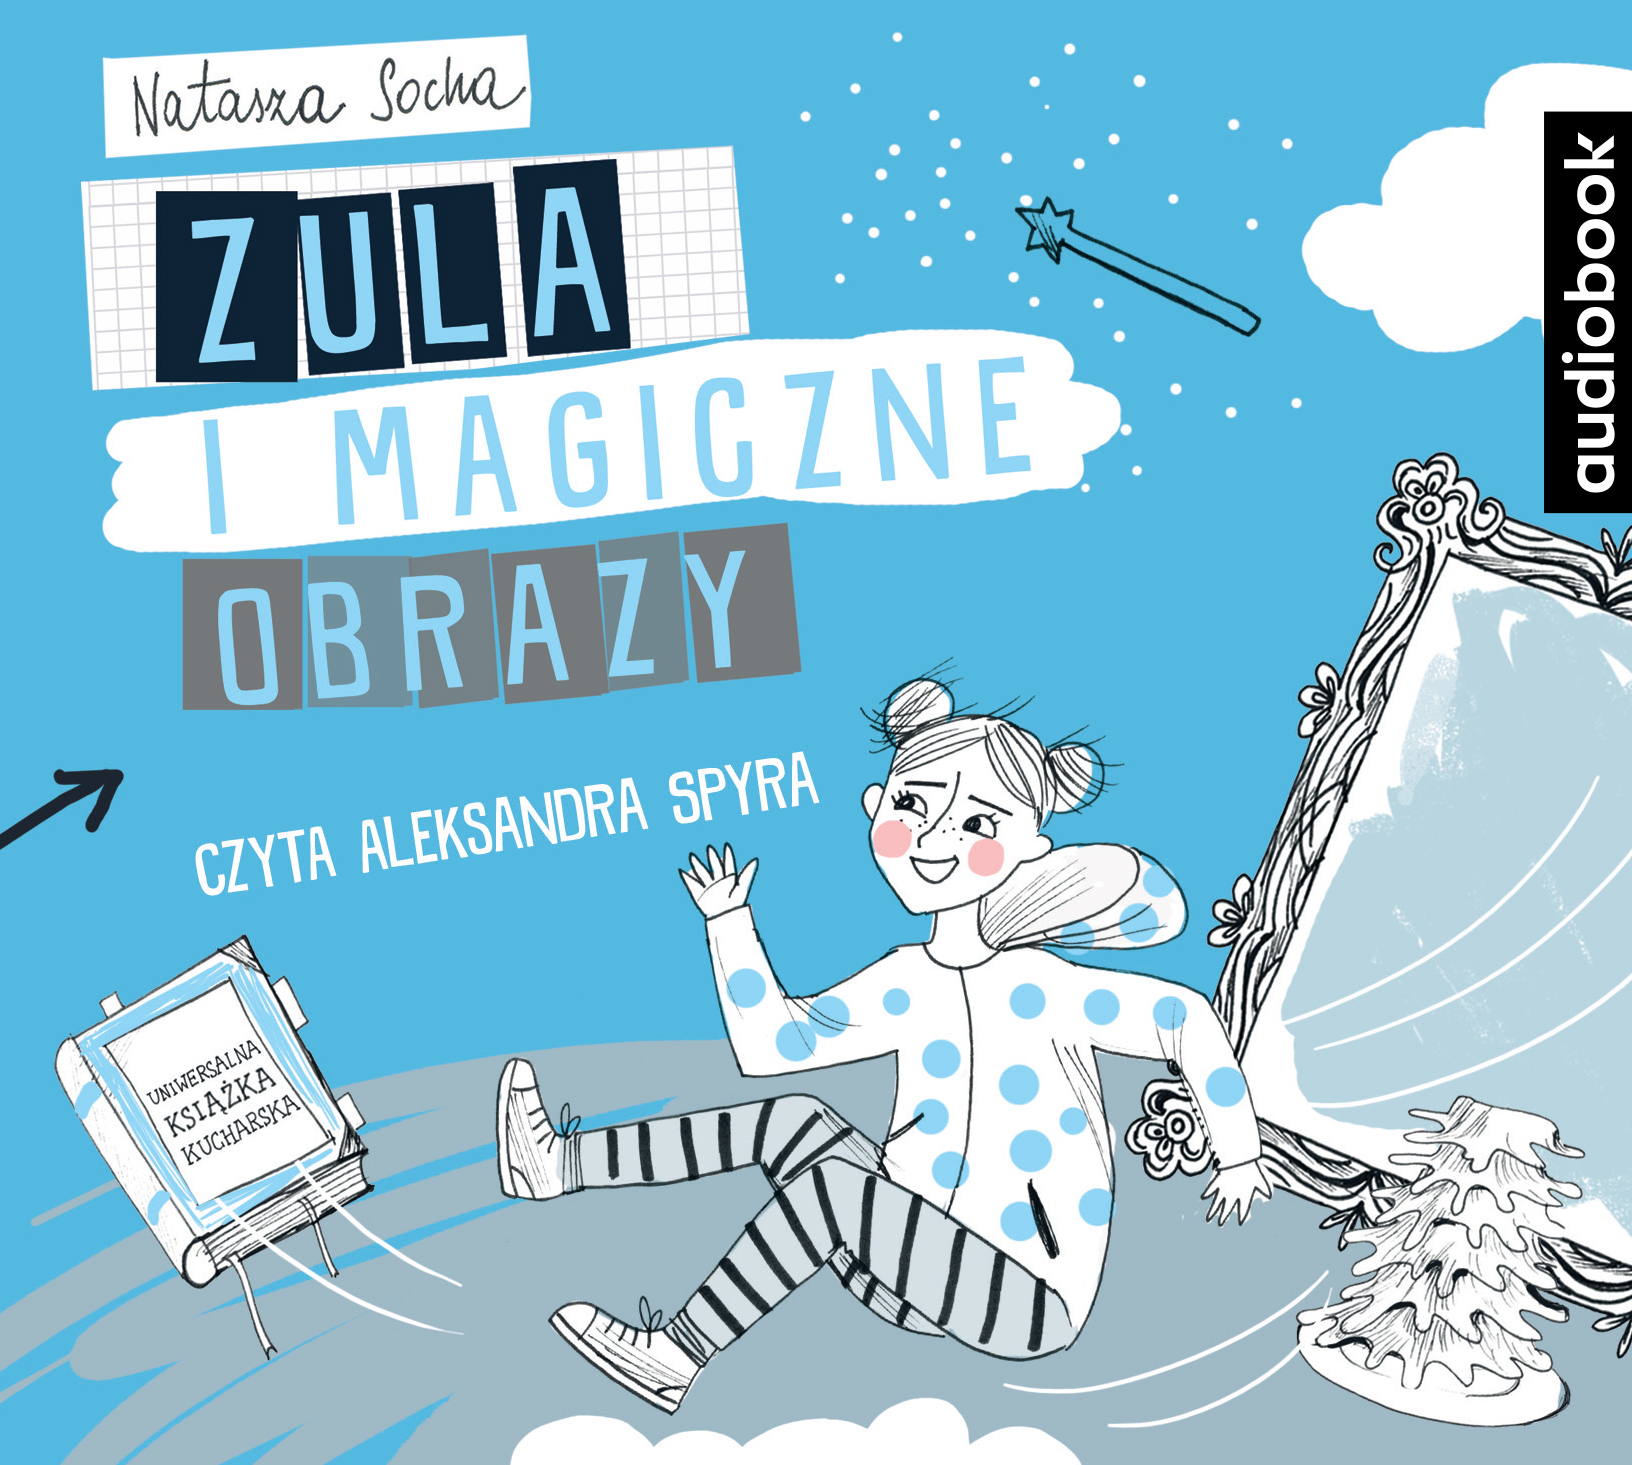 Socha Natasza – Zula I Magiczne Obrazy